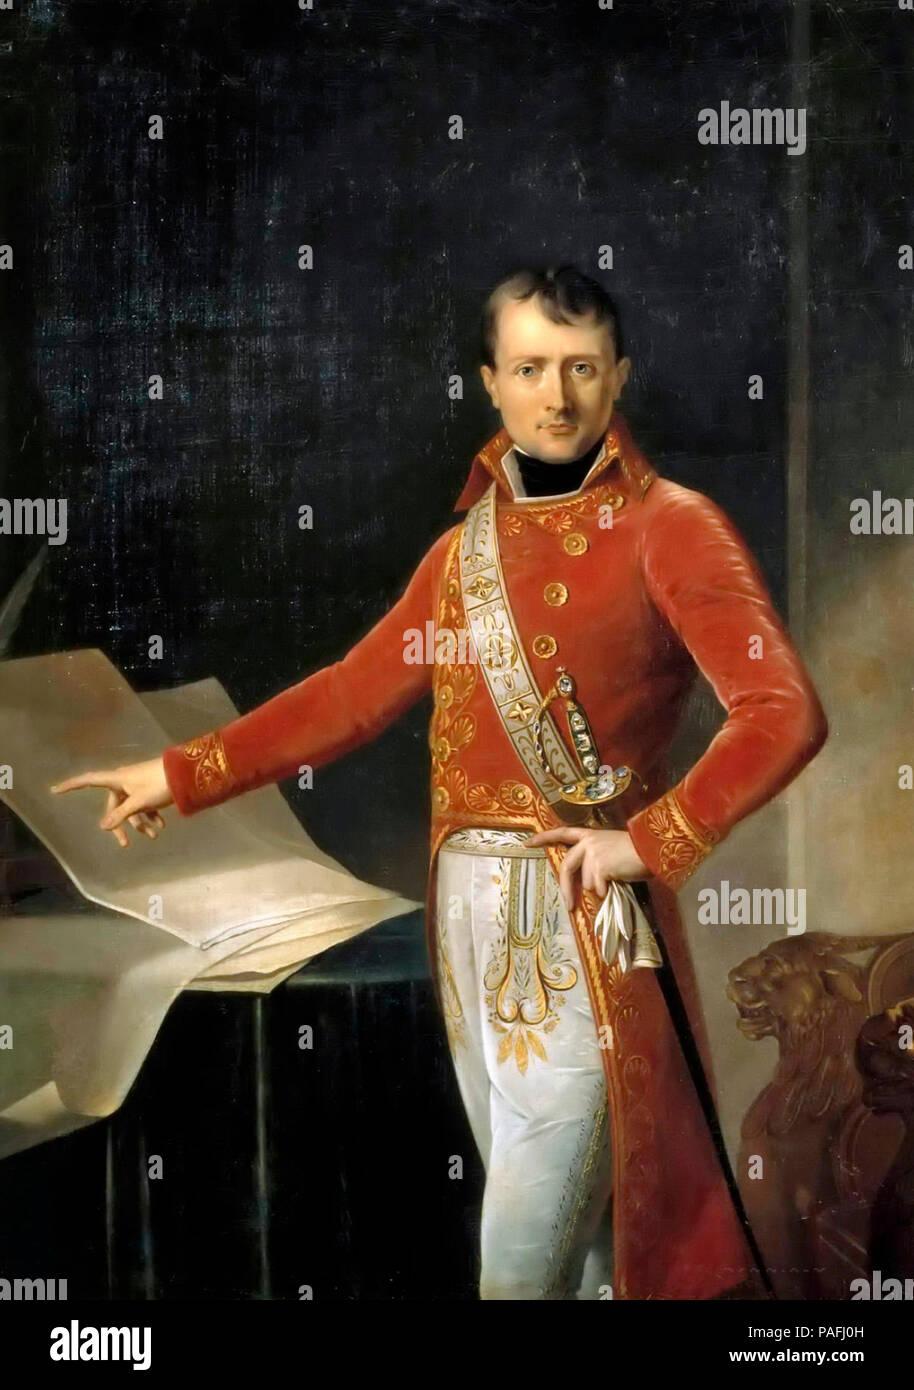 Napoleon Bonaparte, Premier Consul - Portrait of Napoleon I - attributed to Anne-Louis Girodet de Roussy-Trioson - Stock Image